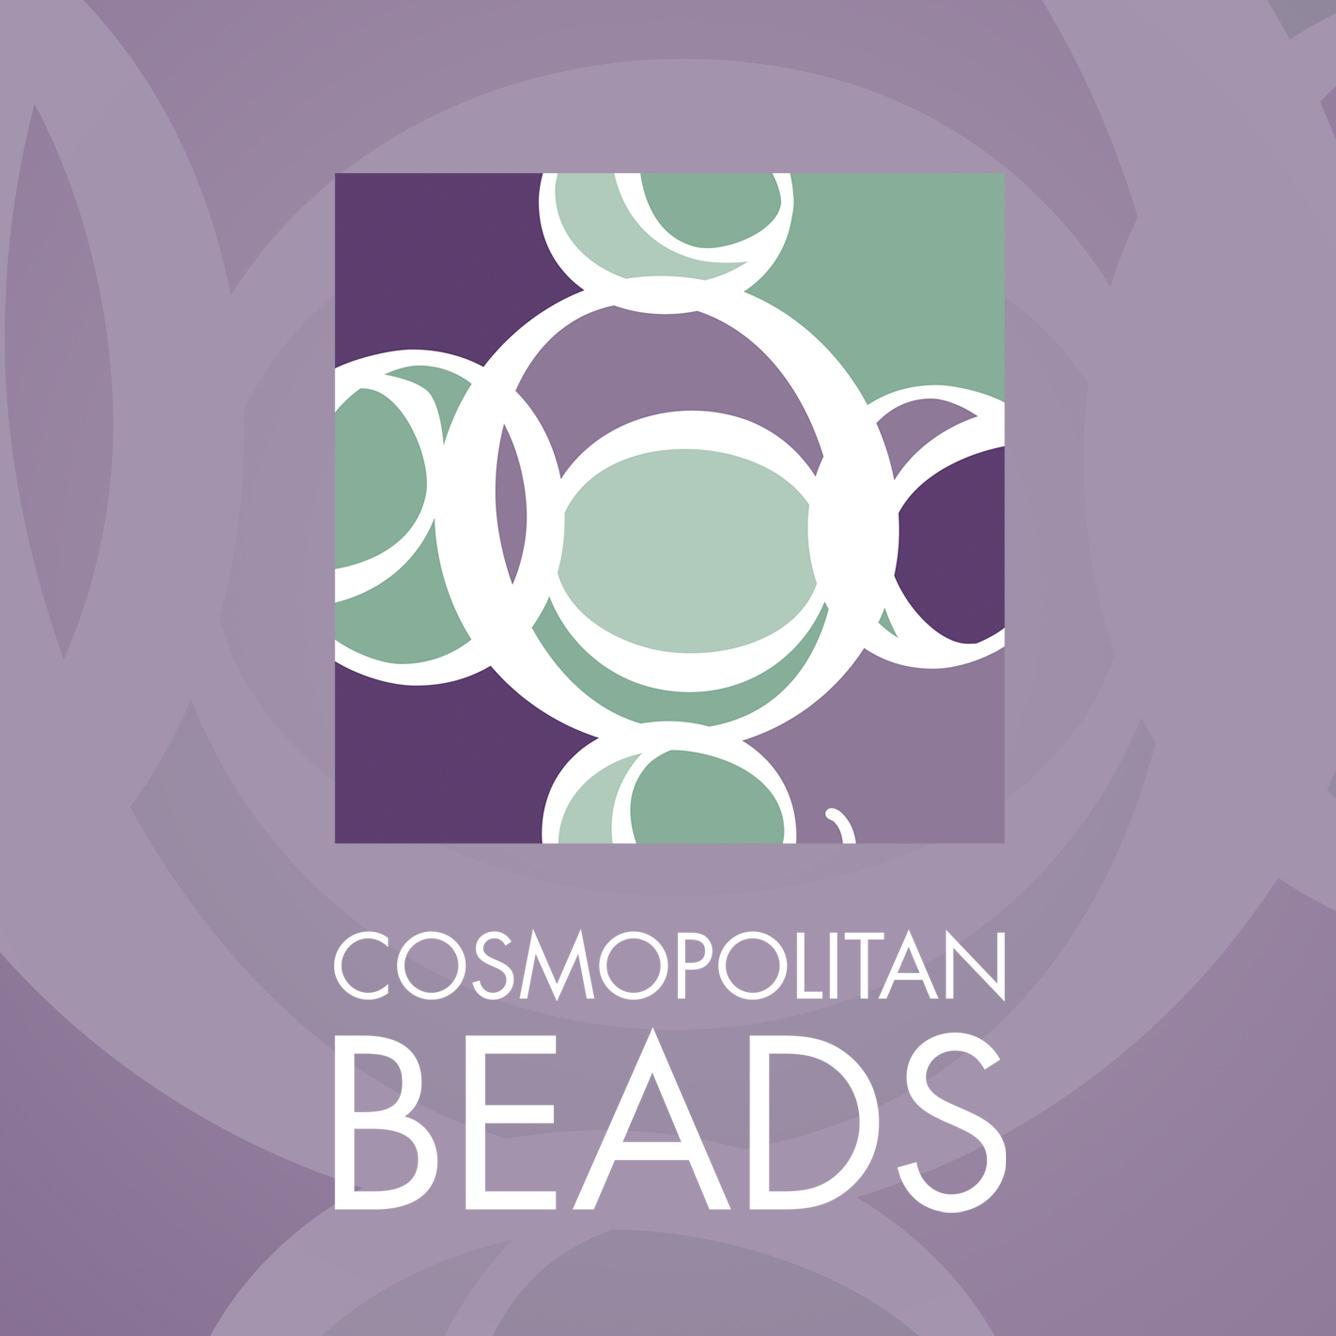 Sommerset Design - Cosmopolitan Beads